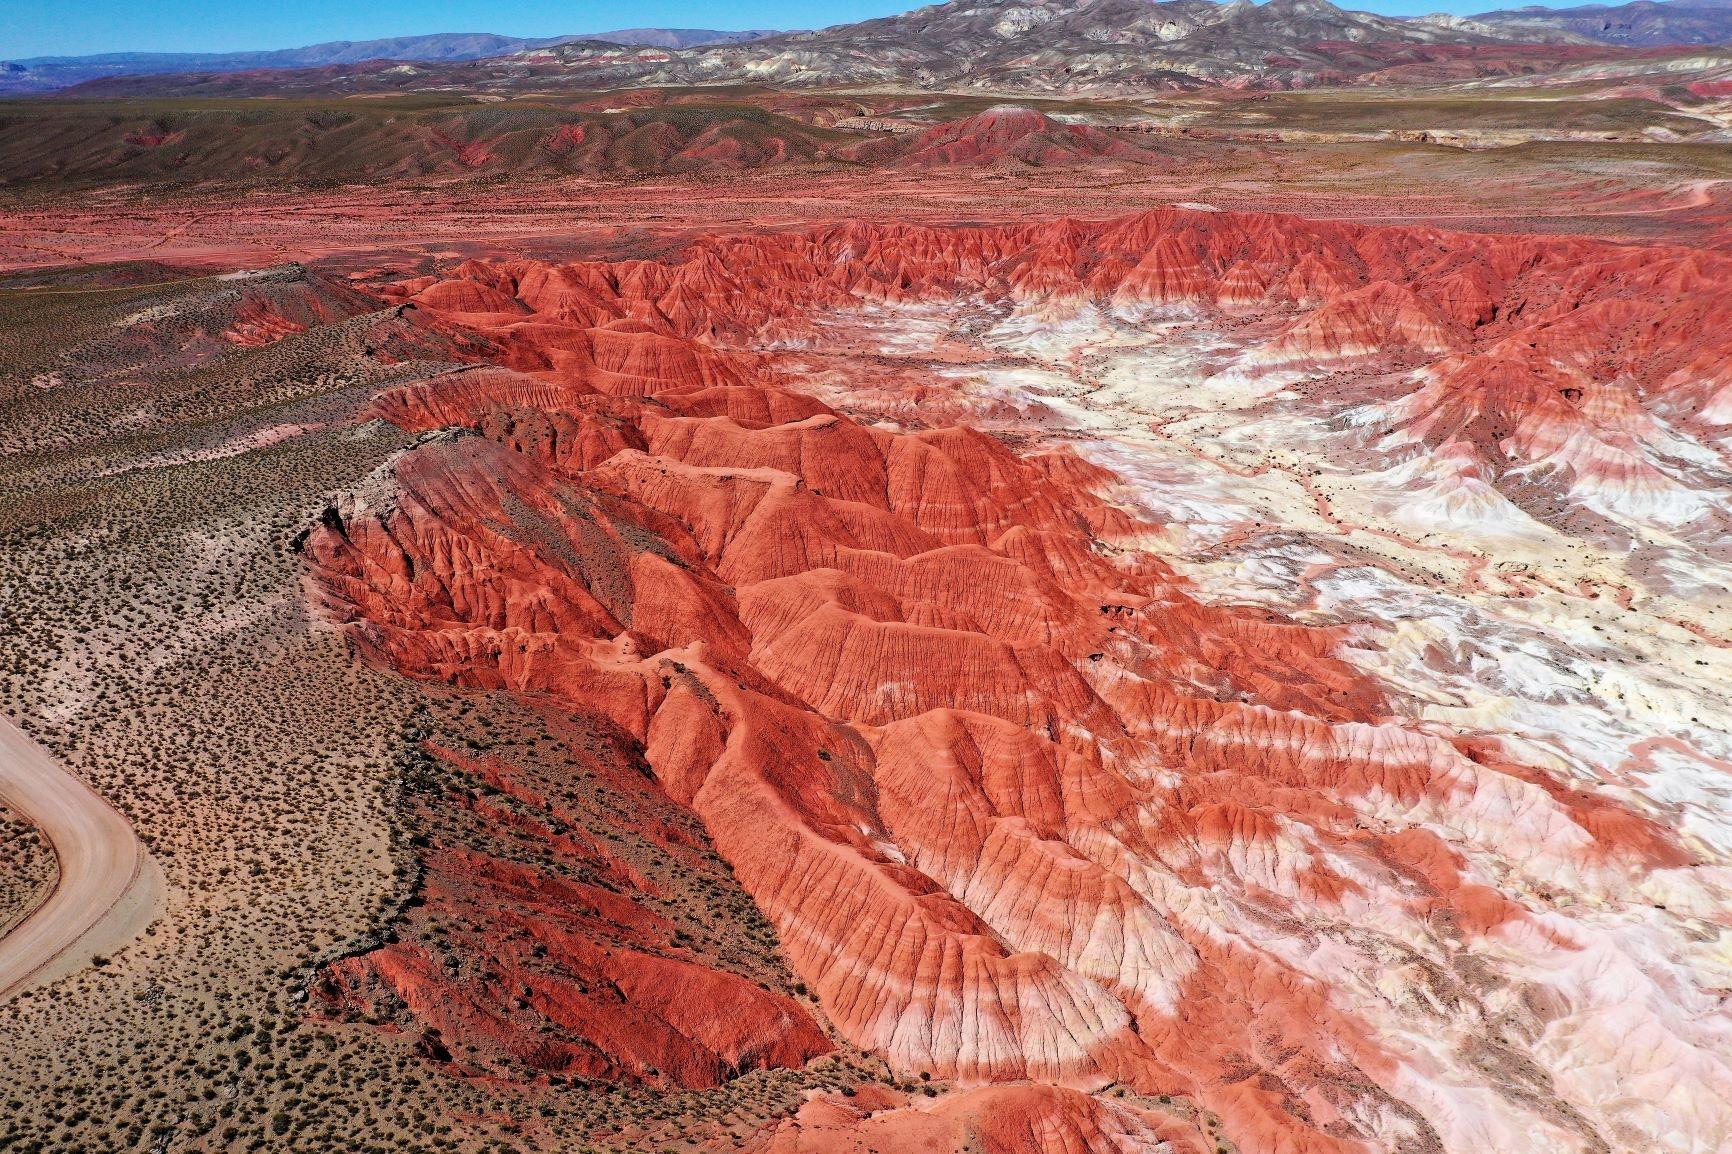 Cusi Cusi: el planeta Marte en la Puna jujeña